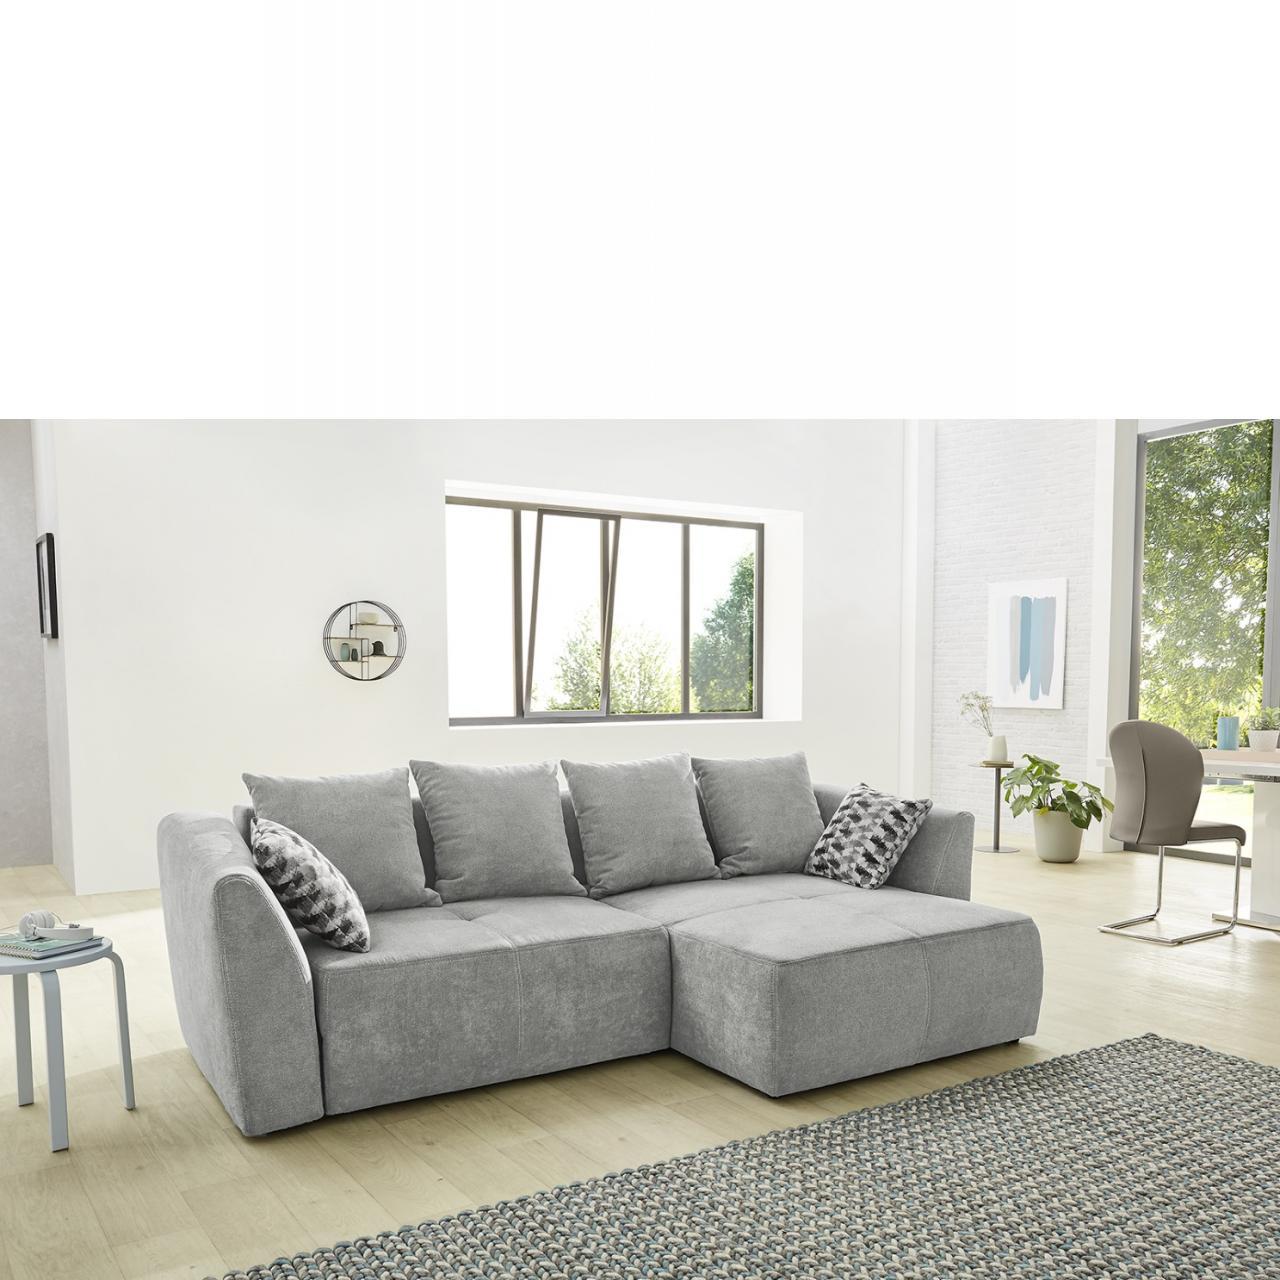 wohnlandschaft tropea wohnlandschaft polsterm bel. Black Bedroom Furniture Sets. Home Design Ideas